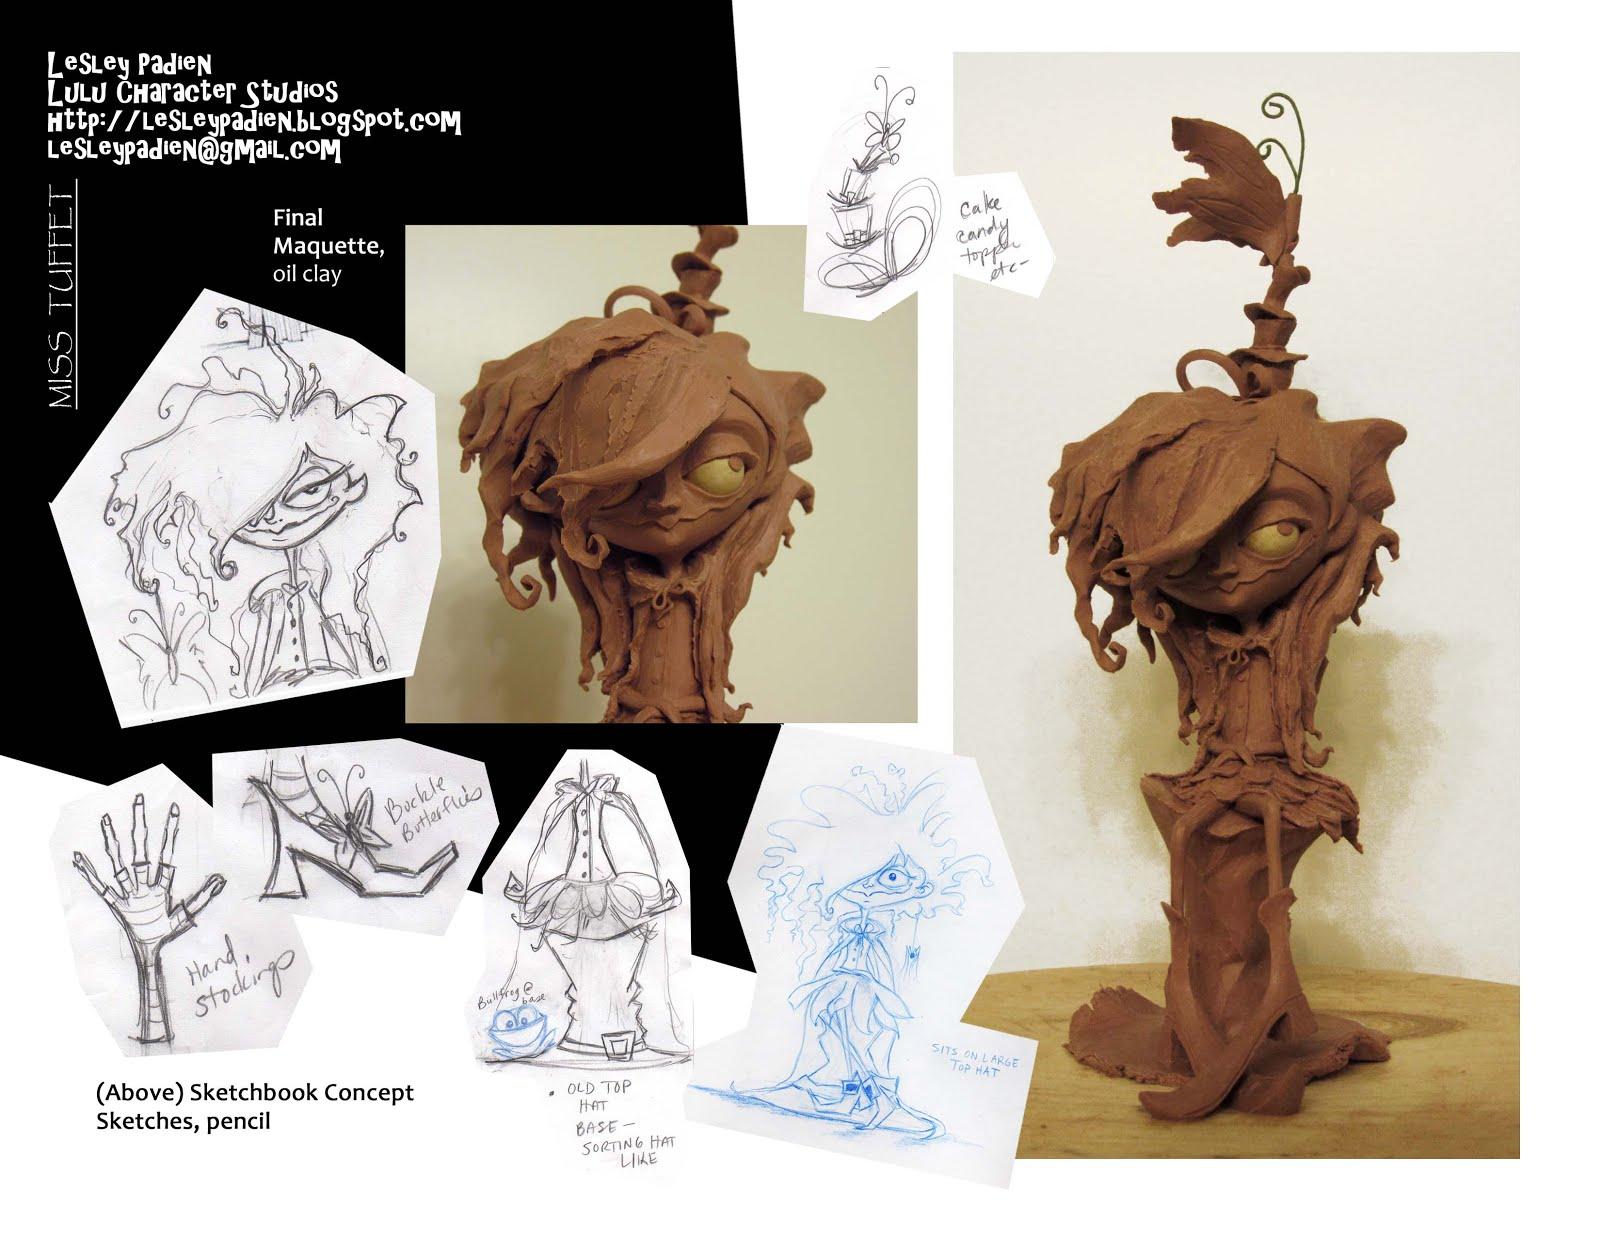 Full Size of Bullfrog Lulu Sofa Preis Character Studios Latest Maquette Designer And Wohnzimmer Bullfrog Lulu